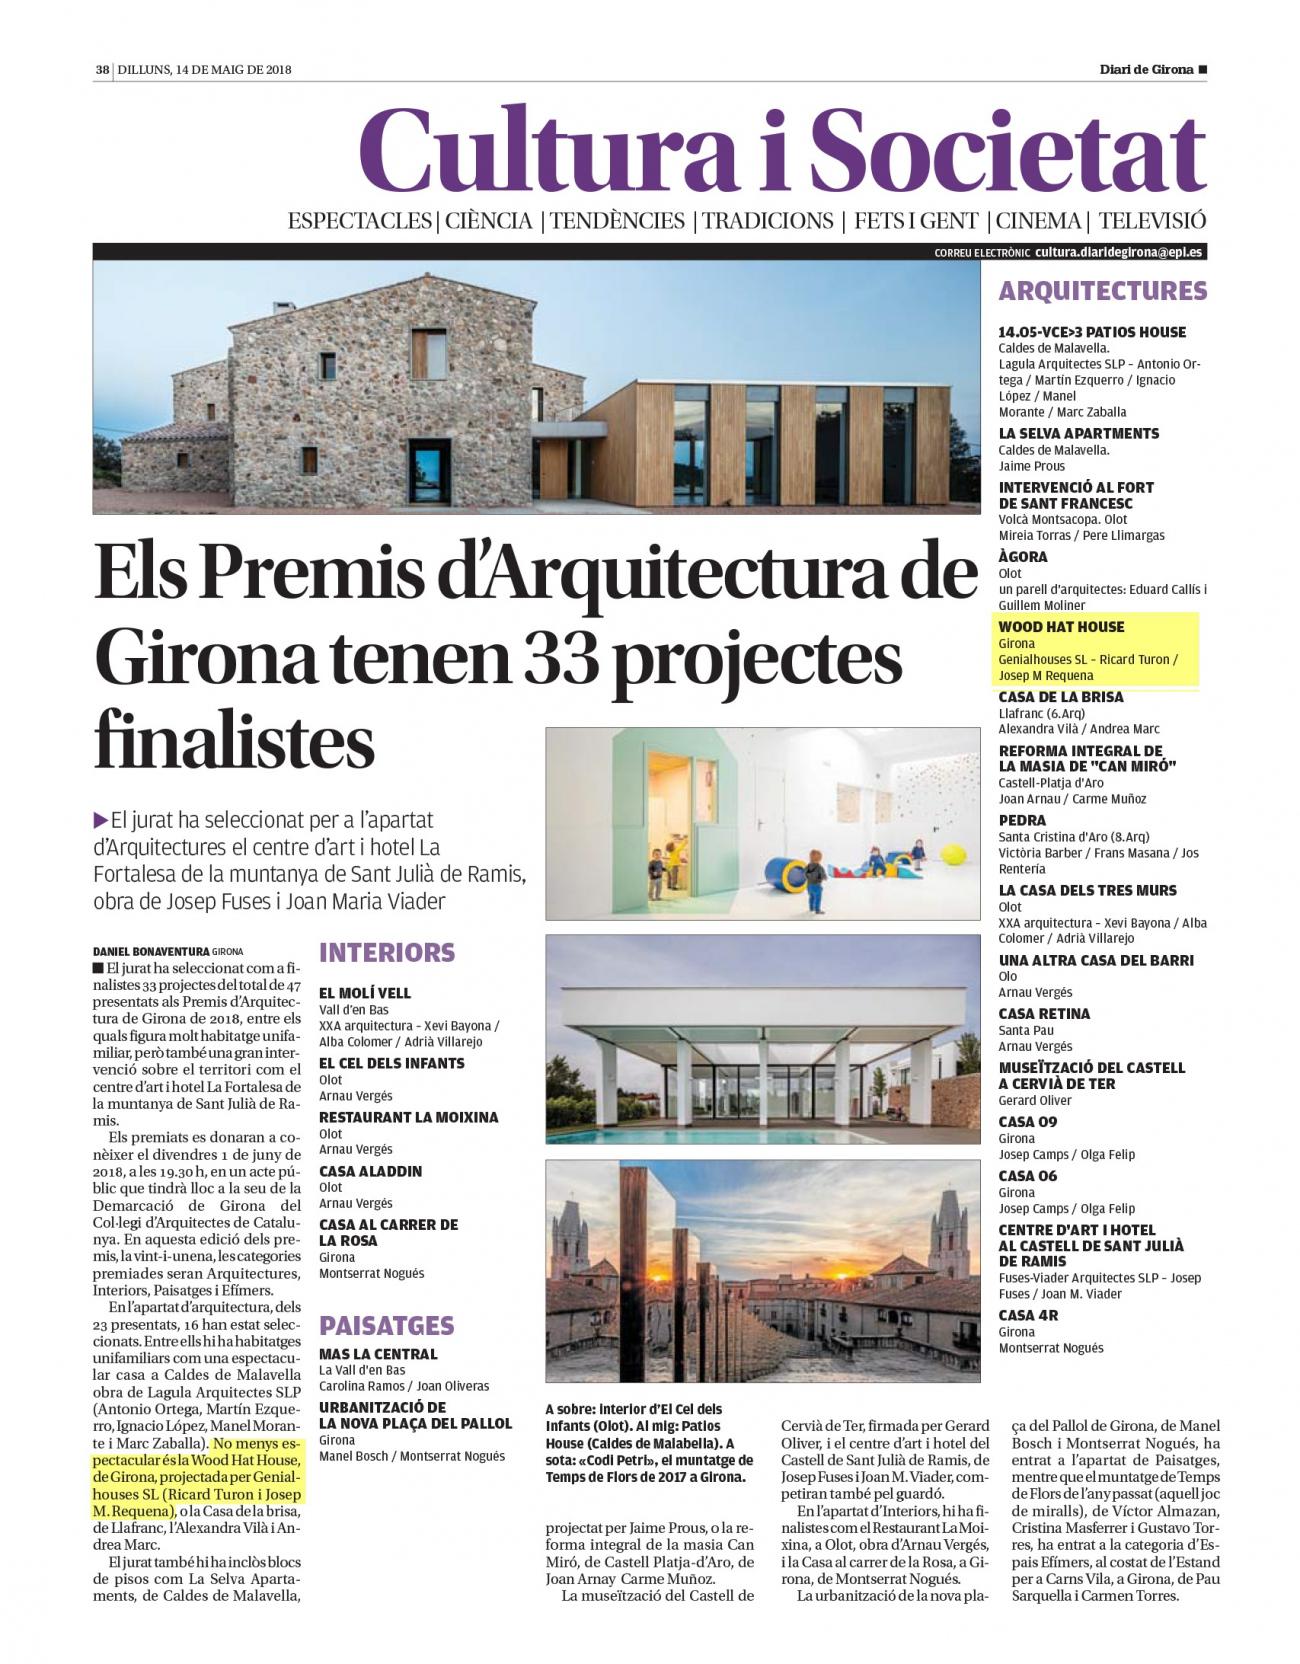 Altre cop Genial Houses finalista als premis d'Arquitectura / De nuevo Genial Houses finalista en los premios de Arquitectura